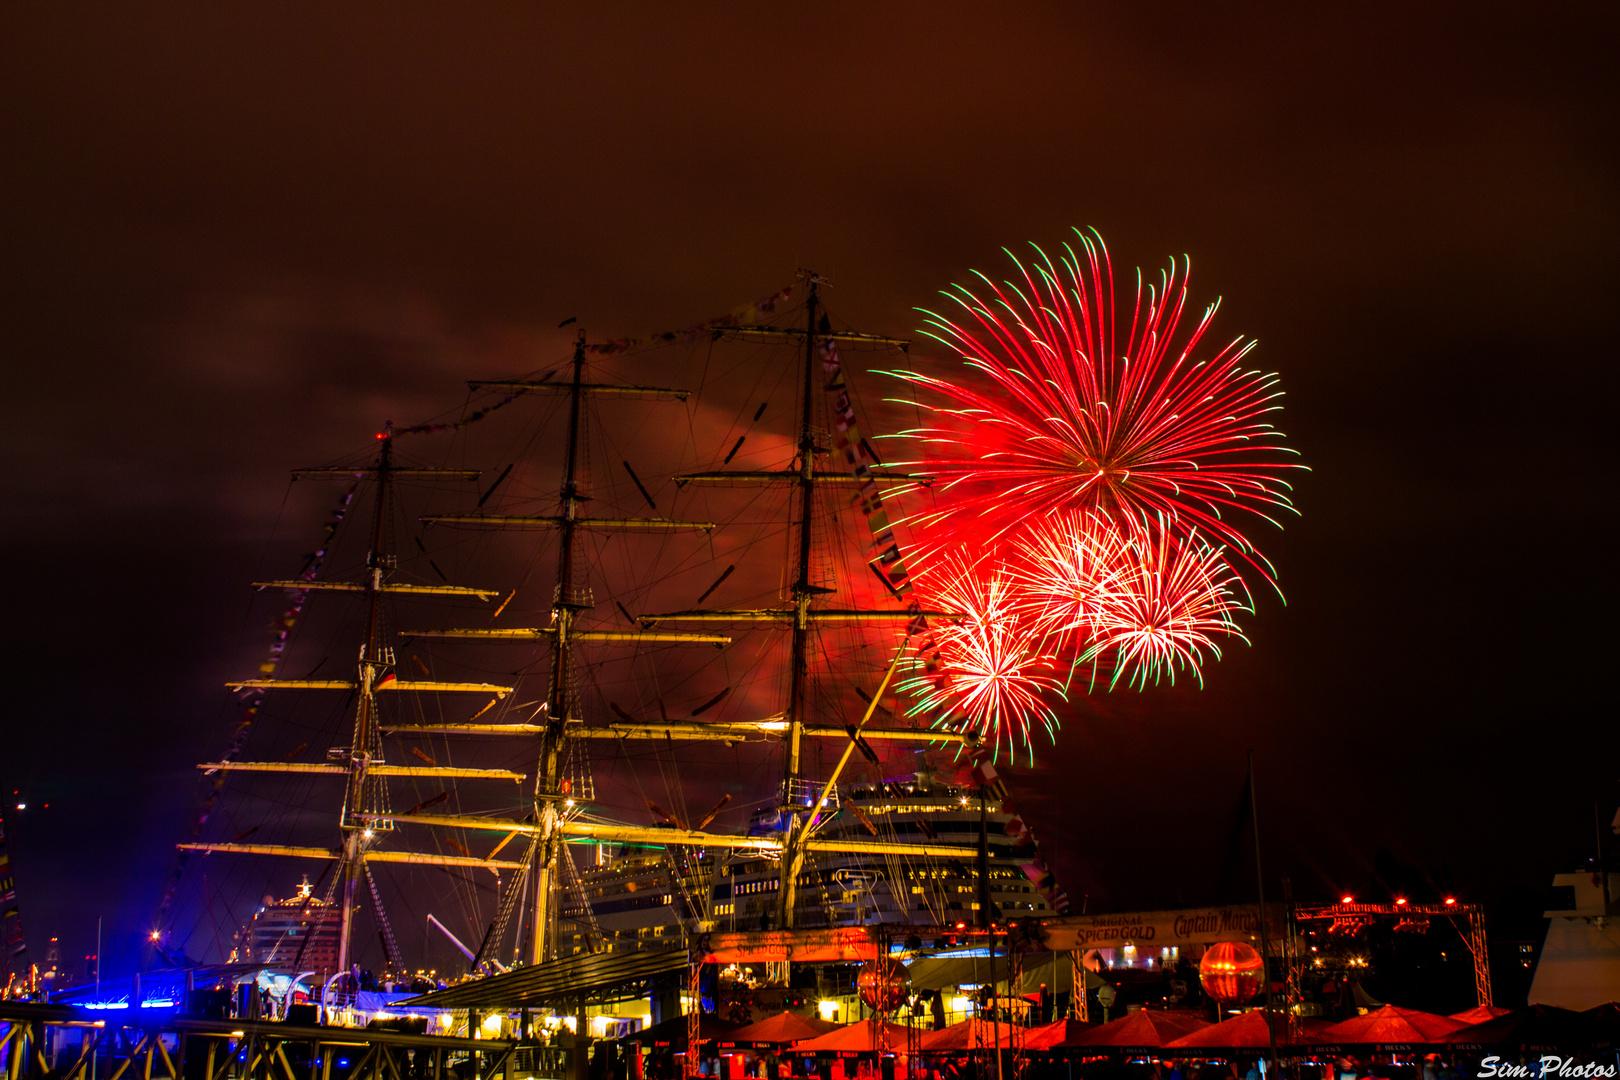 825. Hafengeburtstag Hamburg (AIDA Stella - AIDA Sol) (Feuerwerk) 2